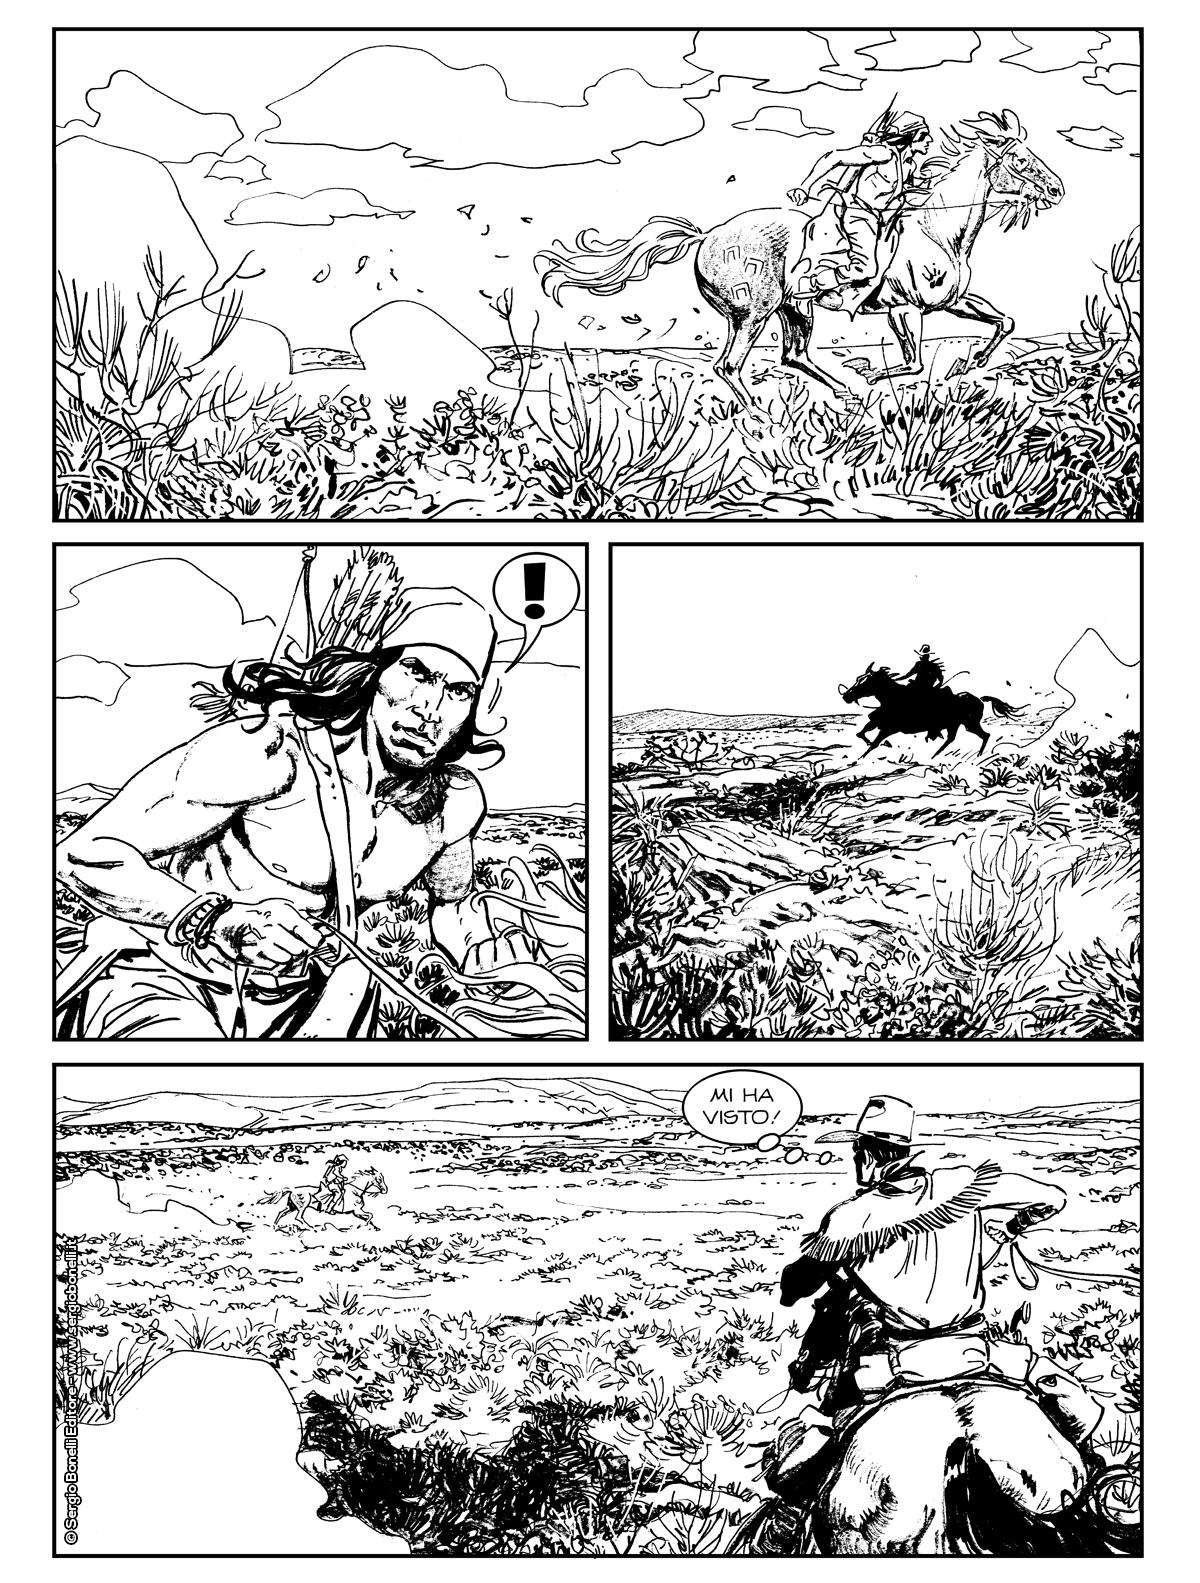 Tex Willer 6: Coyoteros, anteprima 02